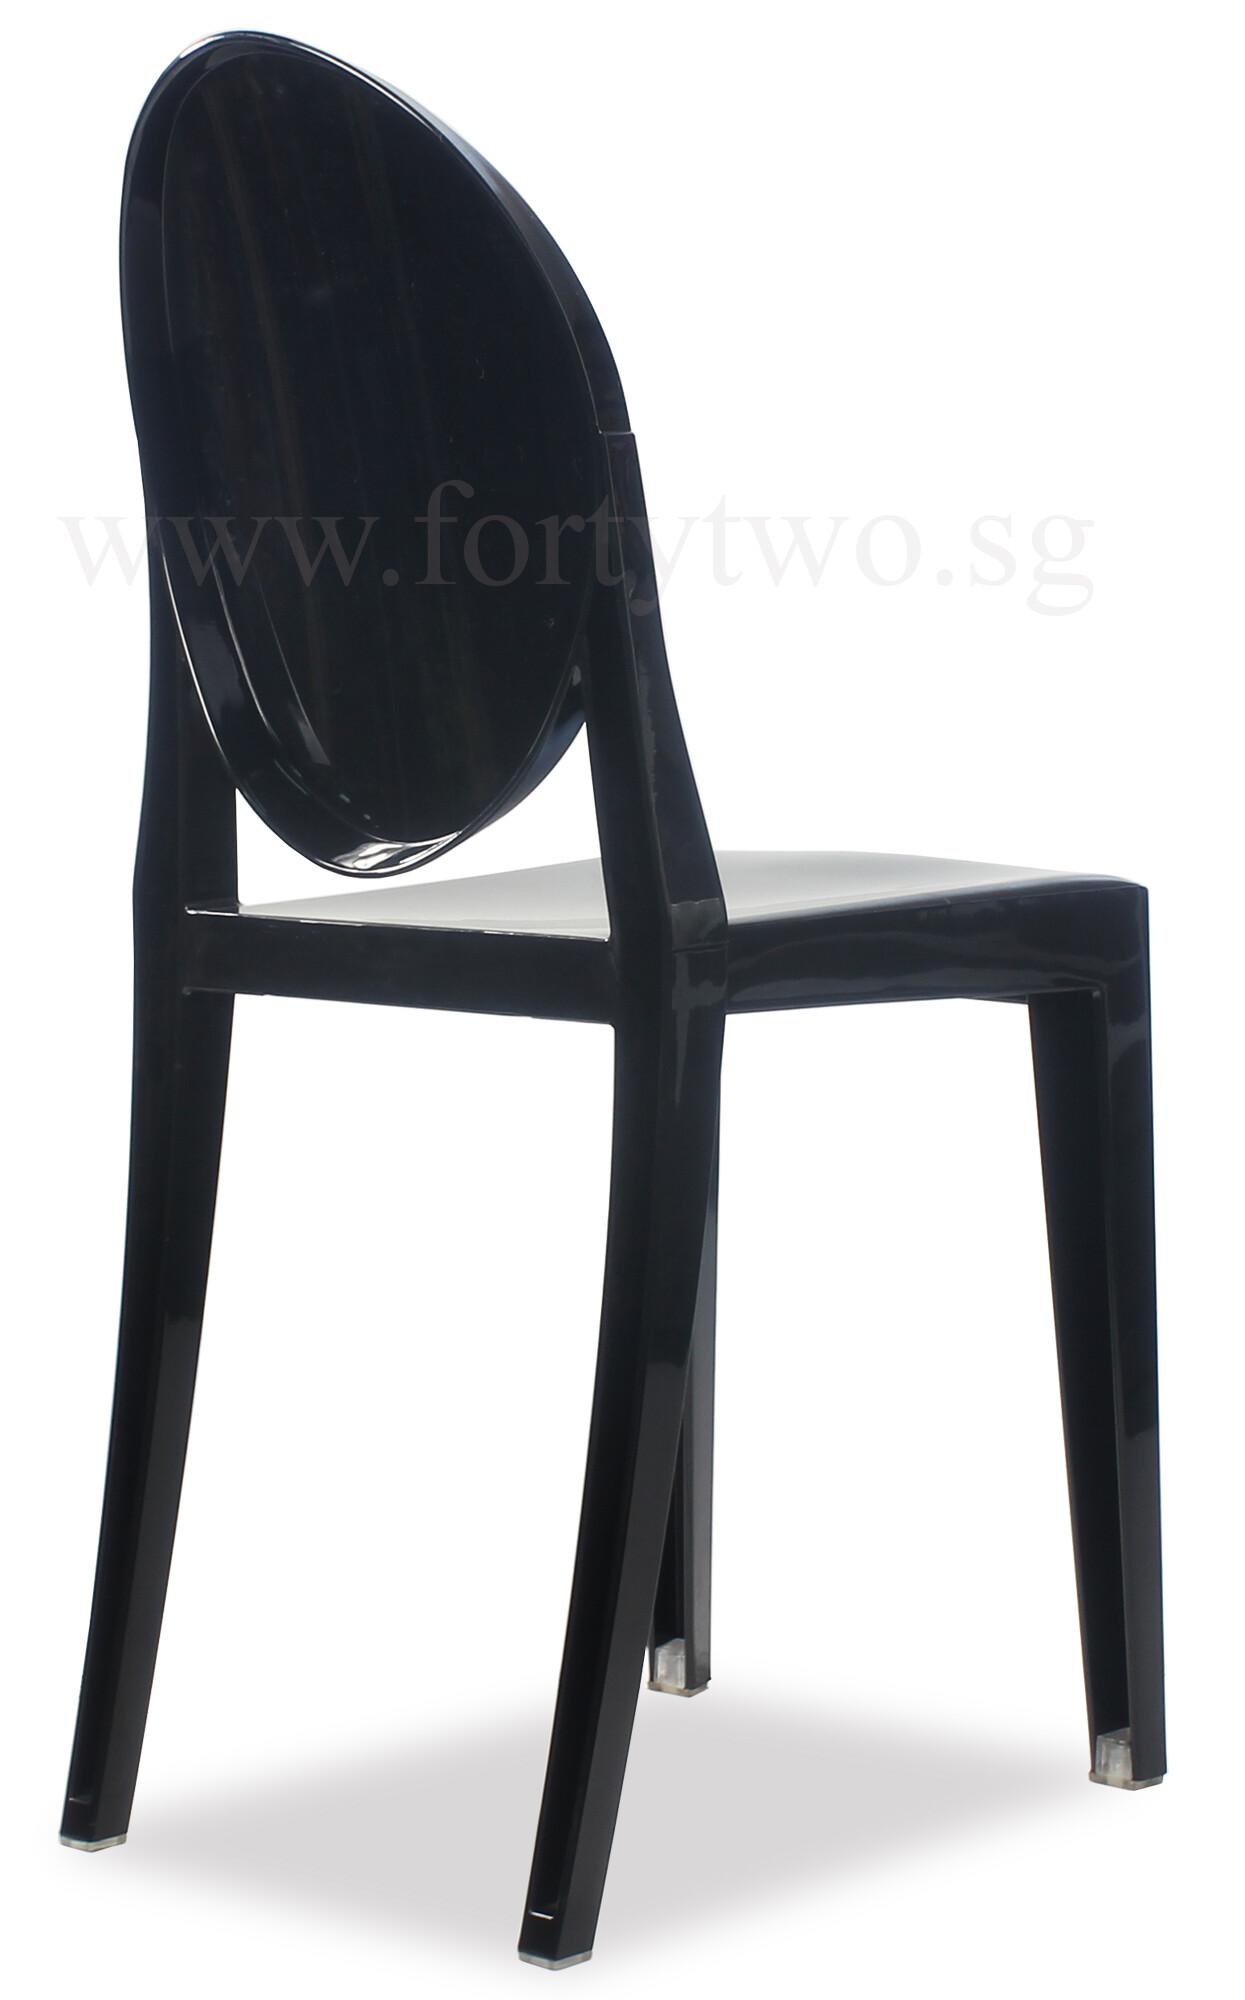 ghost chair replica gunlocke value designer louis black furniture